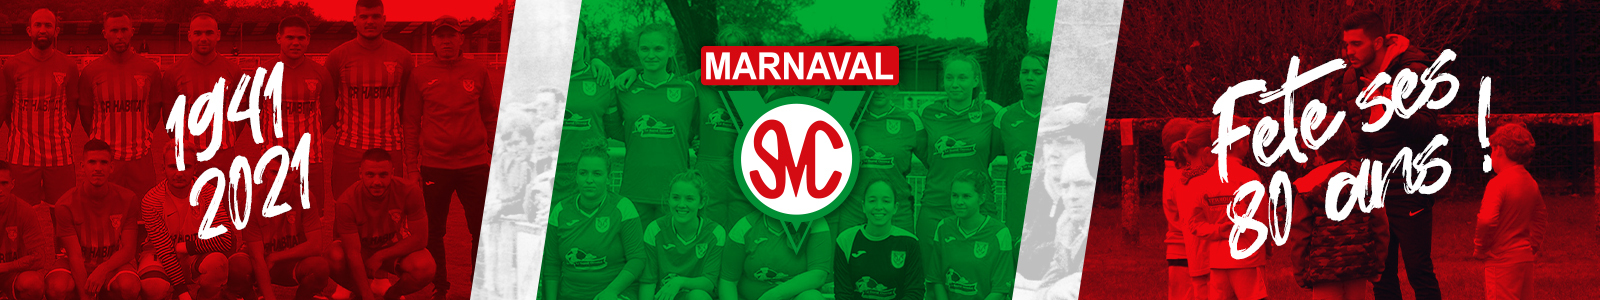 SPORTING MARNAVAL CLUB : site officiel du club de foot de ST DIZIER - footeo